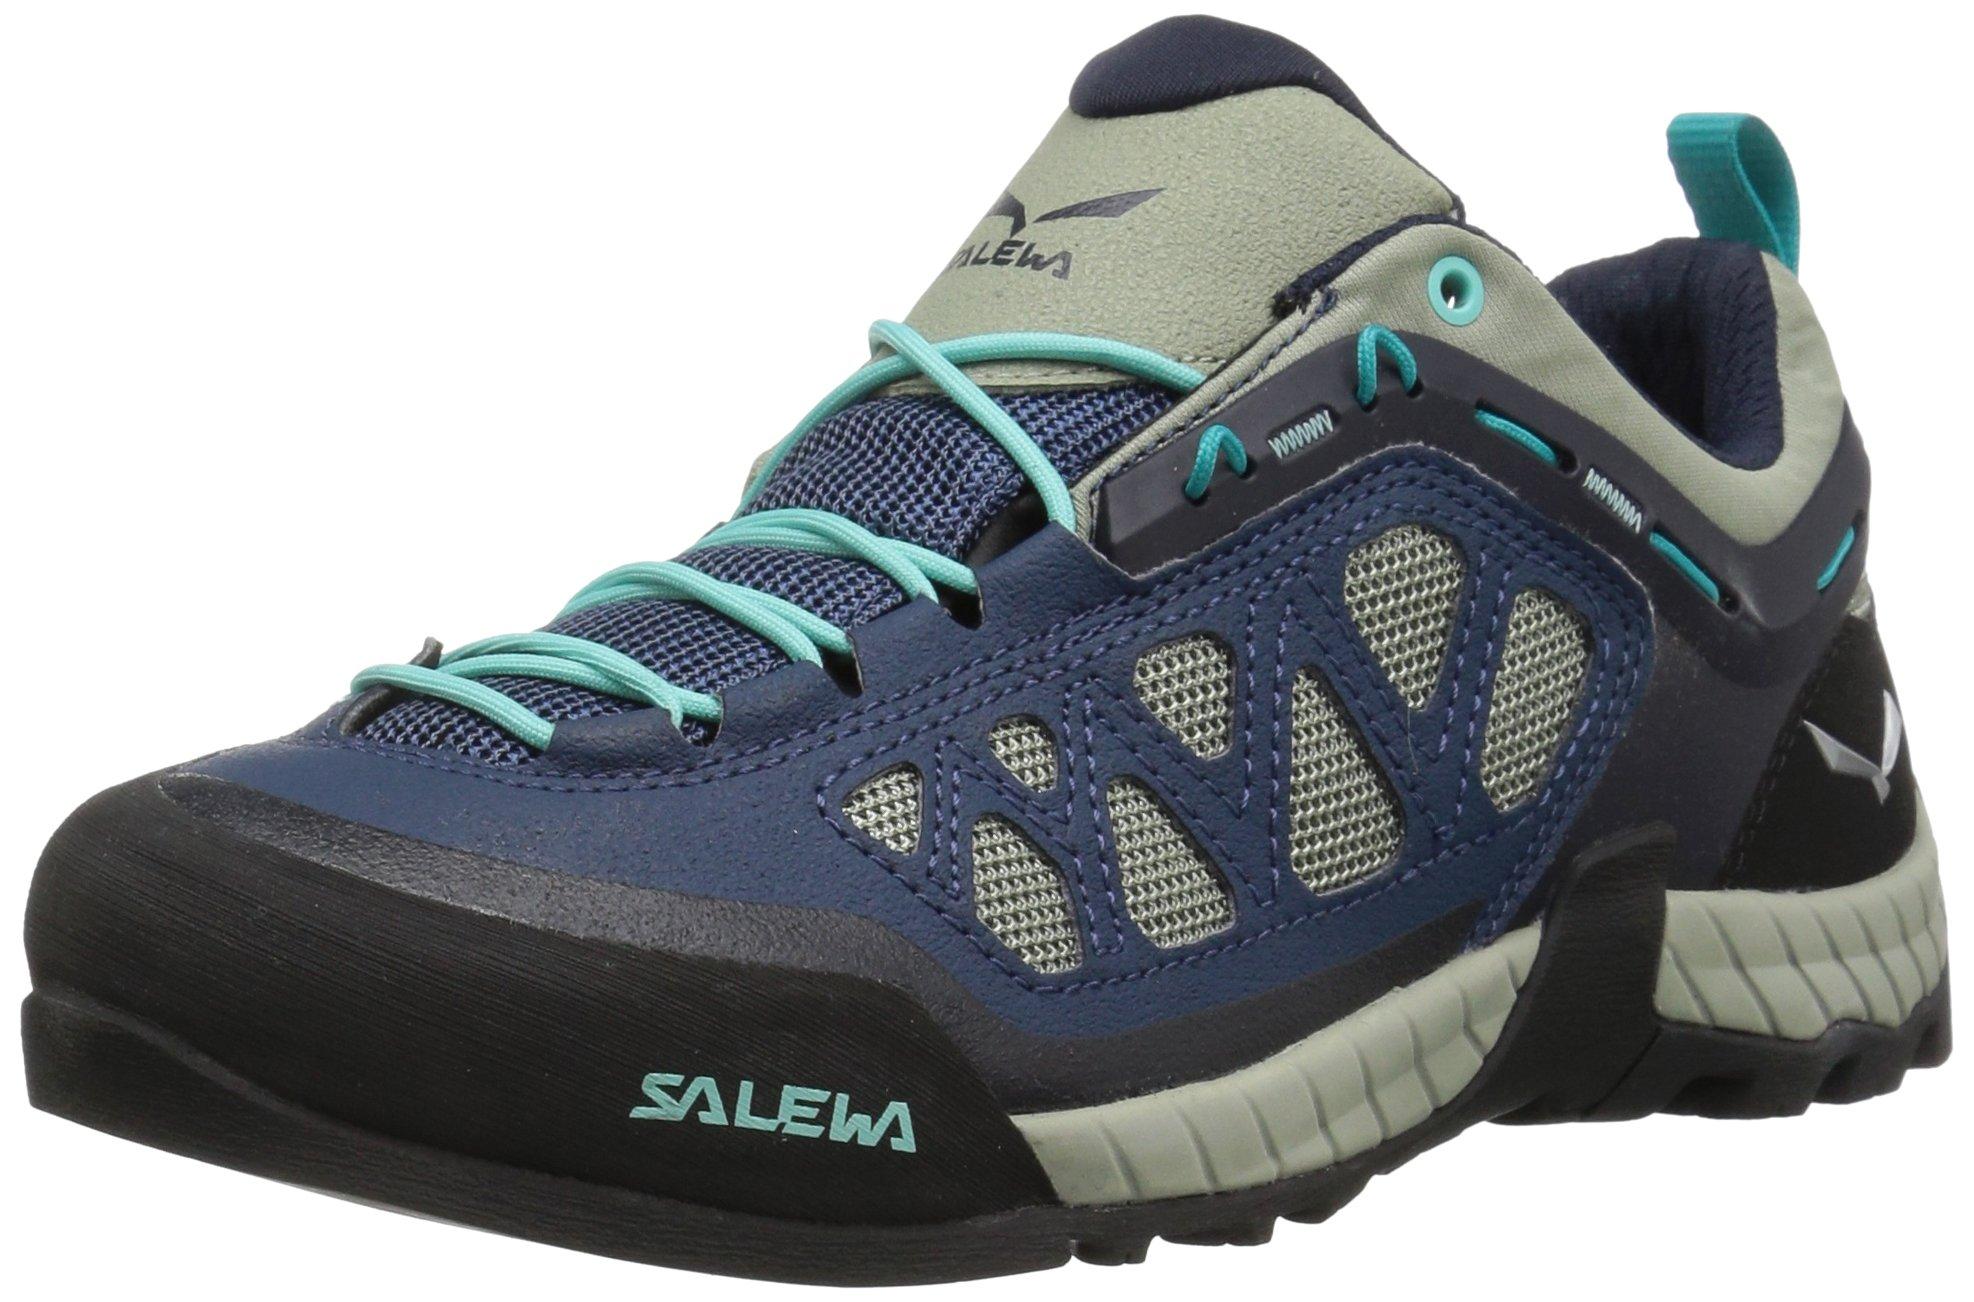 Salewa Women's Firetail 3 Approach Shoes, Dark Denim/Aruba Blue, 7.5